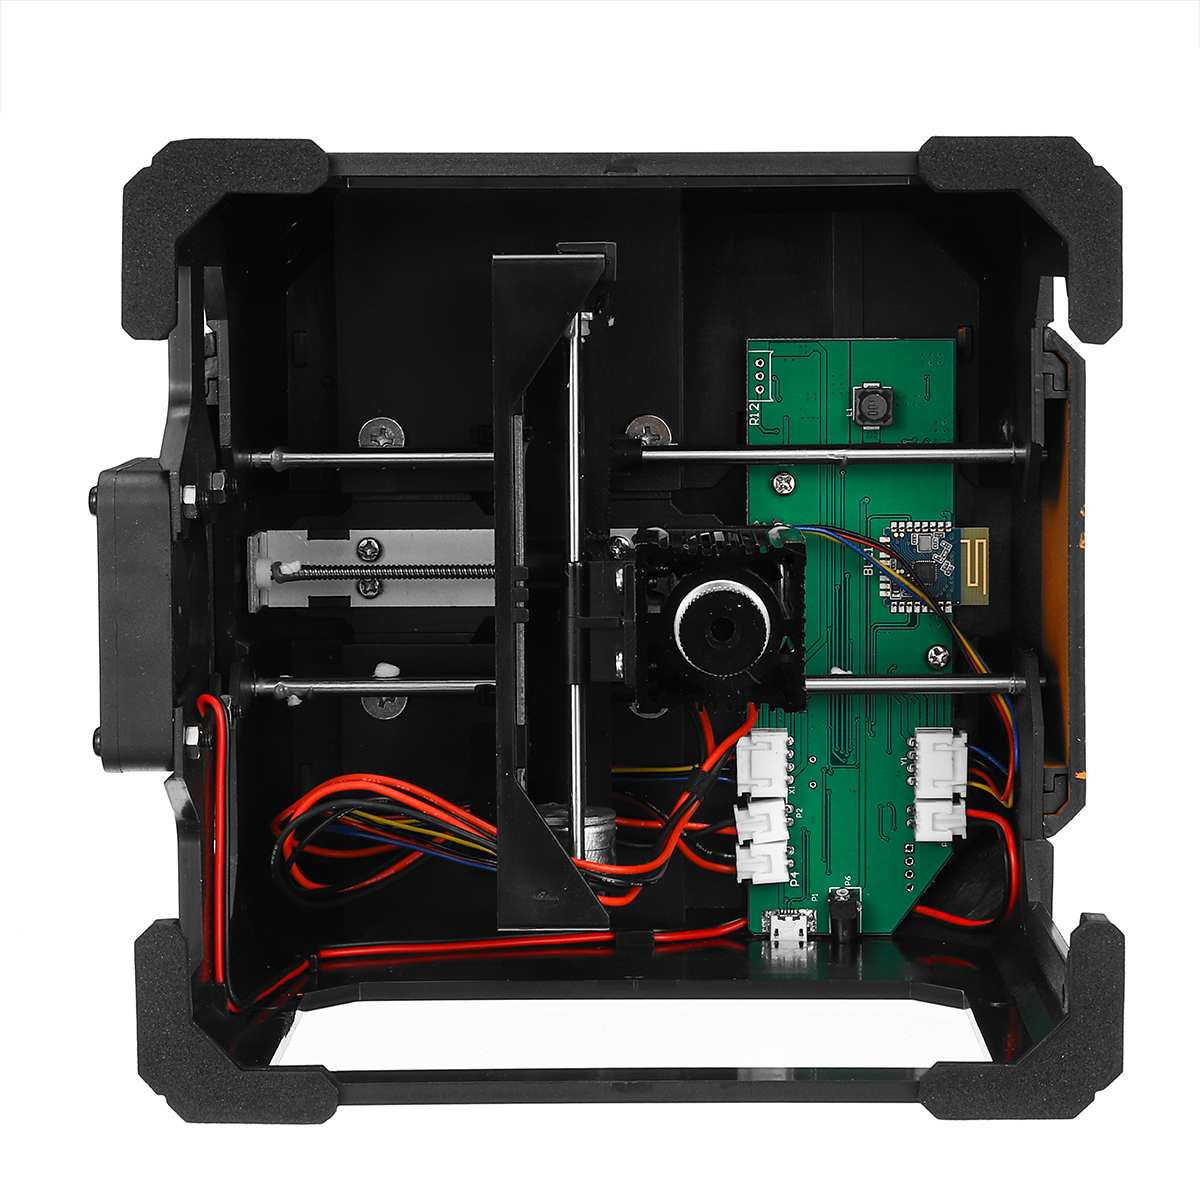 bluetooth Control 3000mW Professional DIY Desktop Mini CNC Laser Engraver Cutter Engraving Wood Cutting Machine Router 110 220V - 5